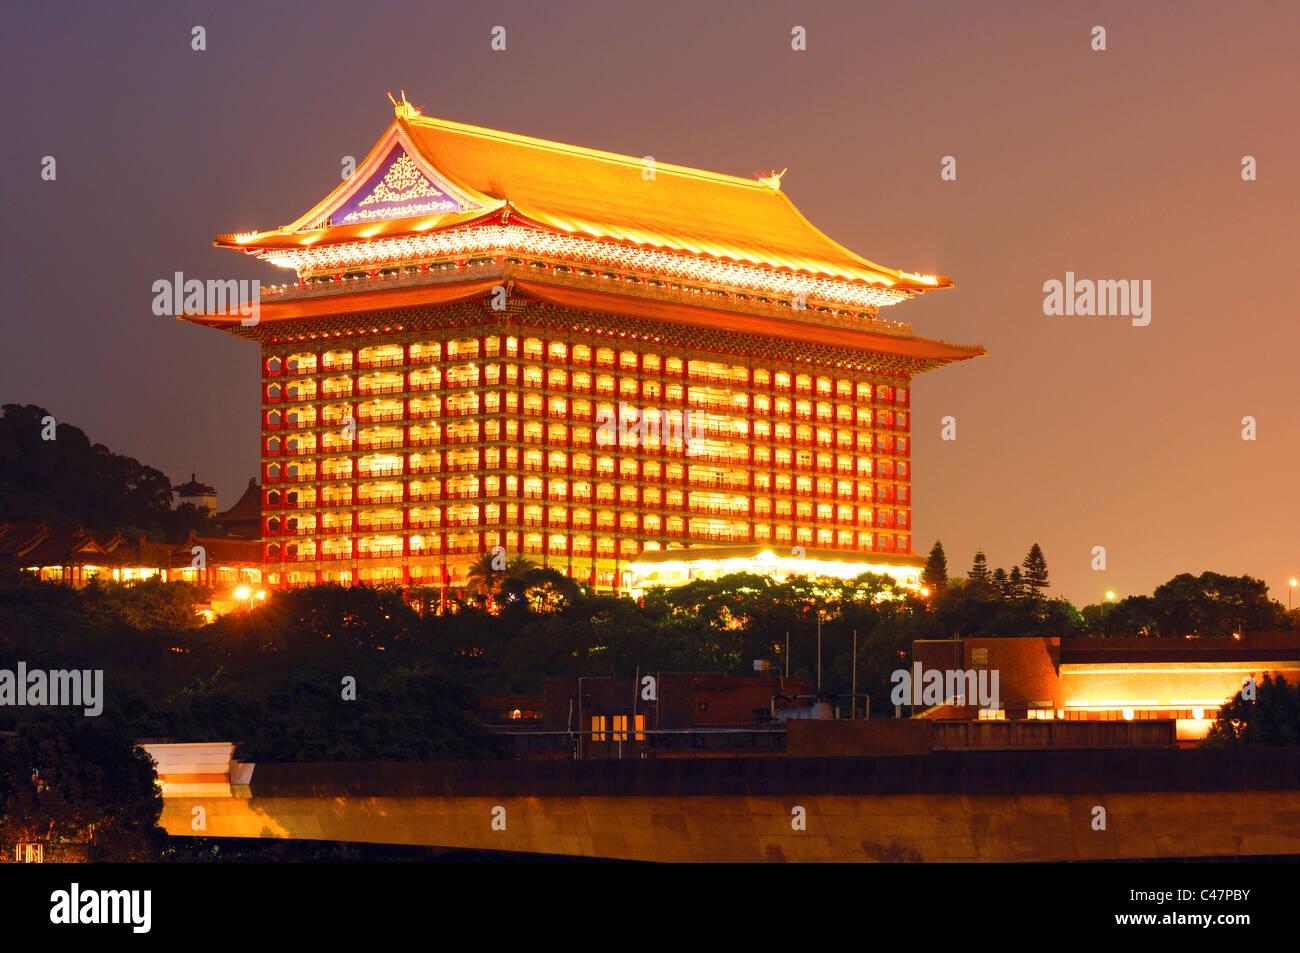 Hotel Lit Up At Night Grand Hotel Taipei Taiwan Stock Photo Alamy